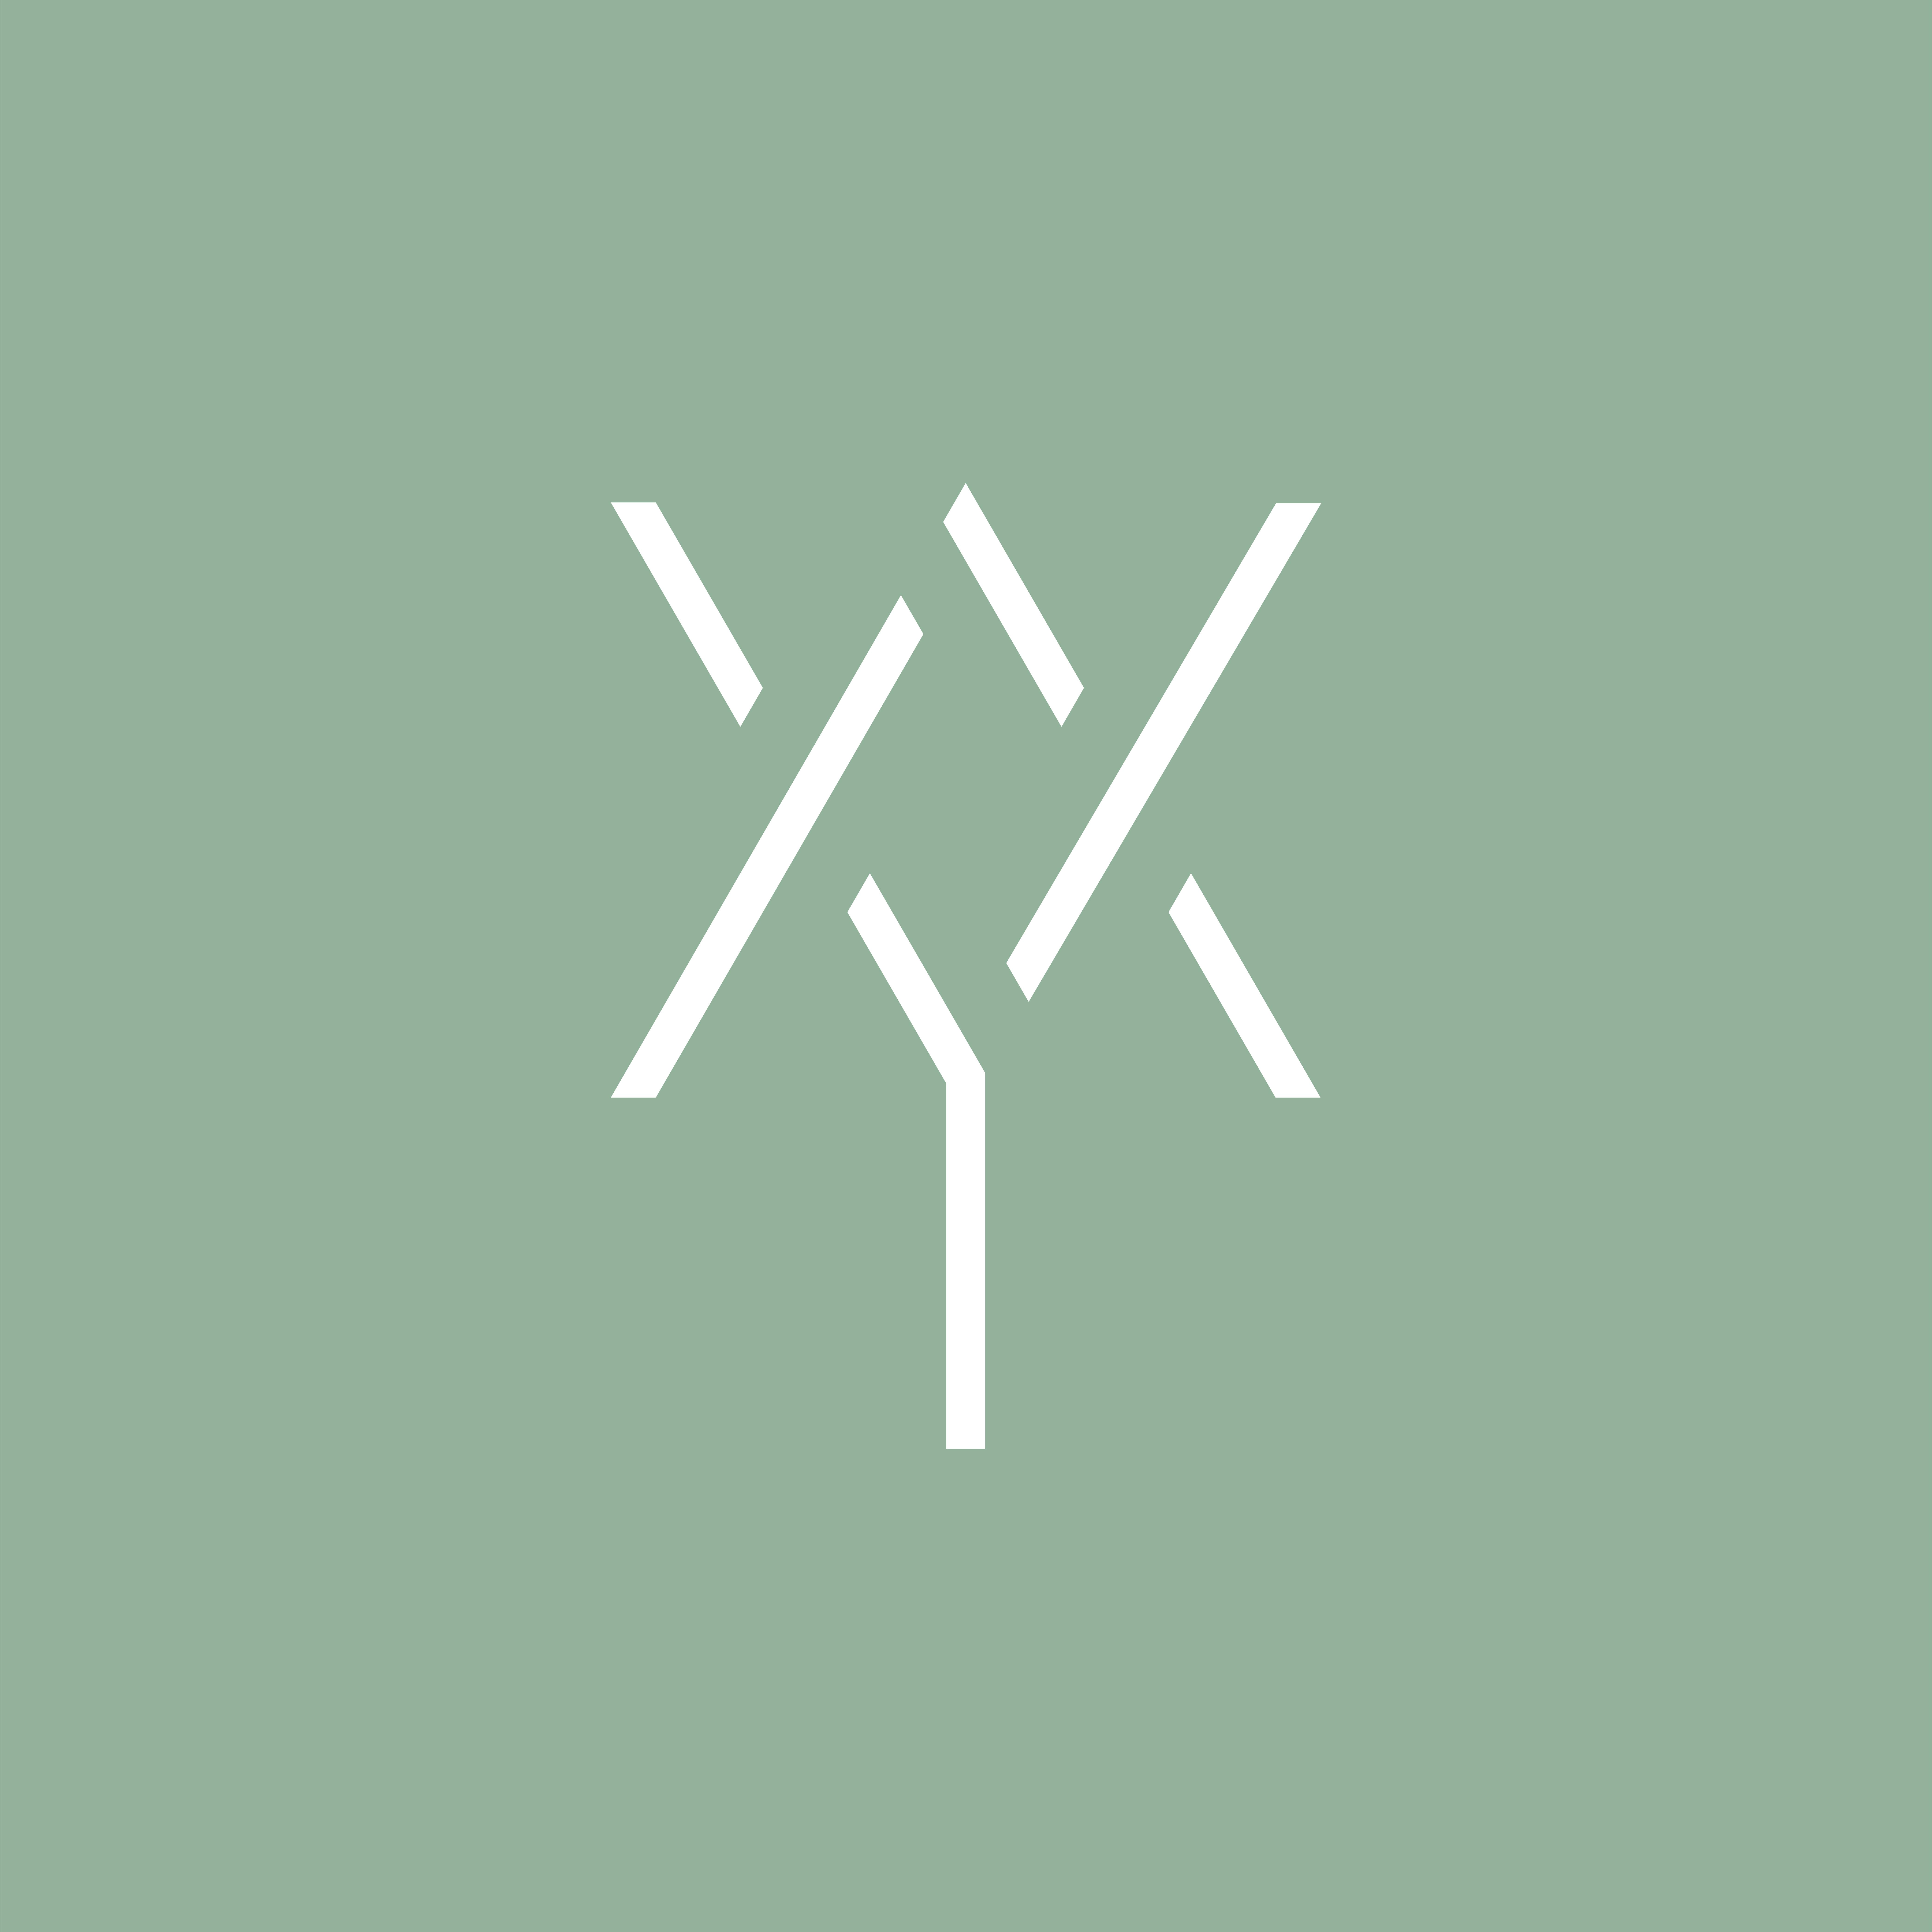 Art of Yoga logo symbol